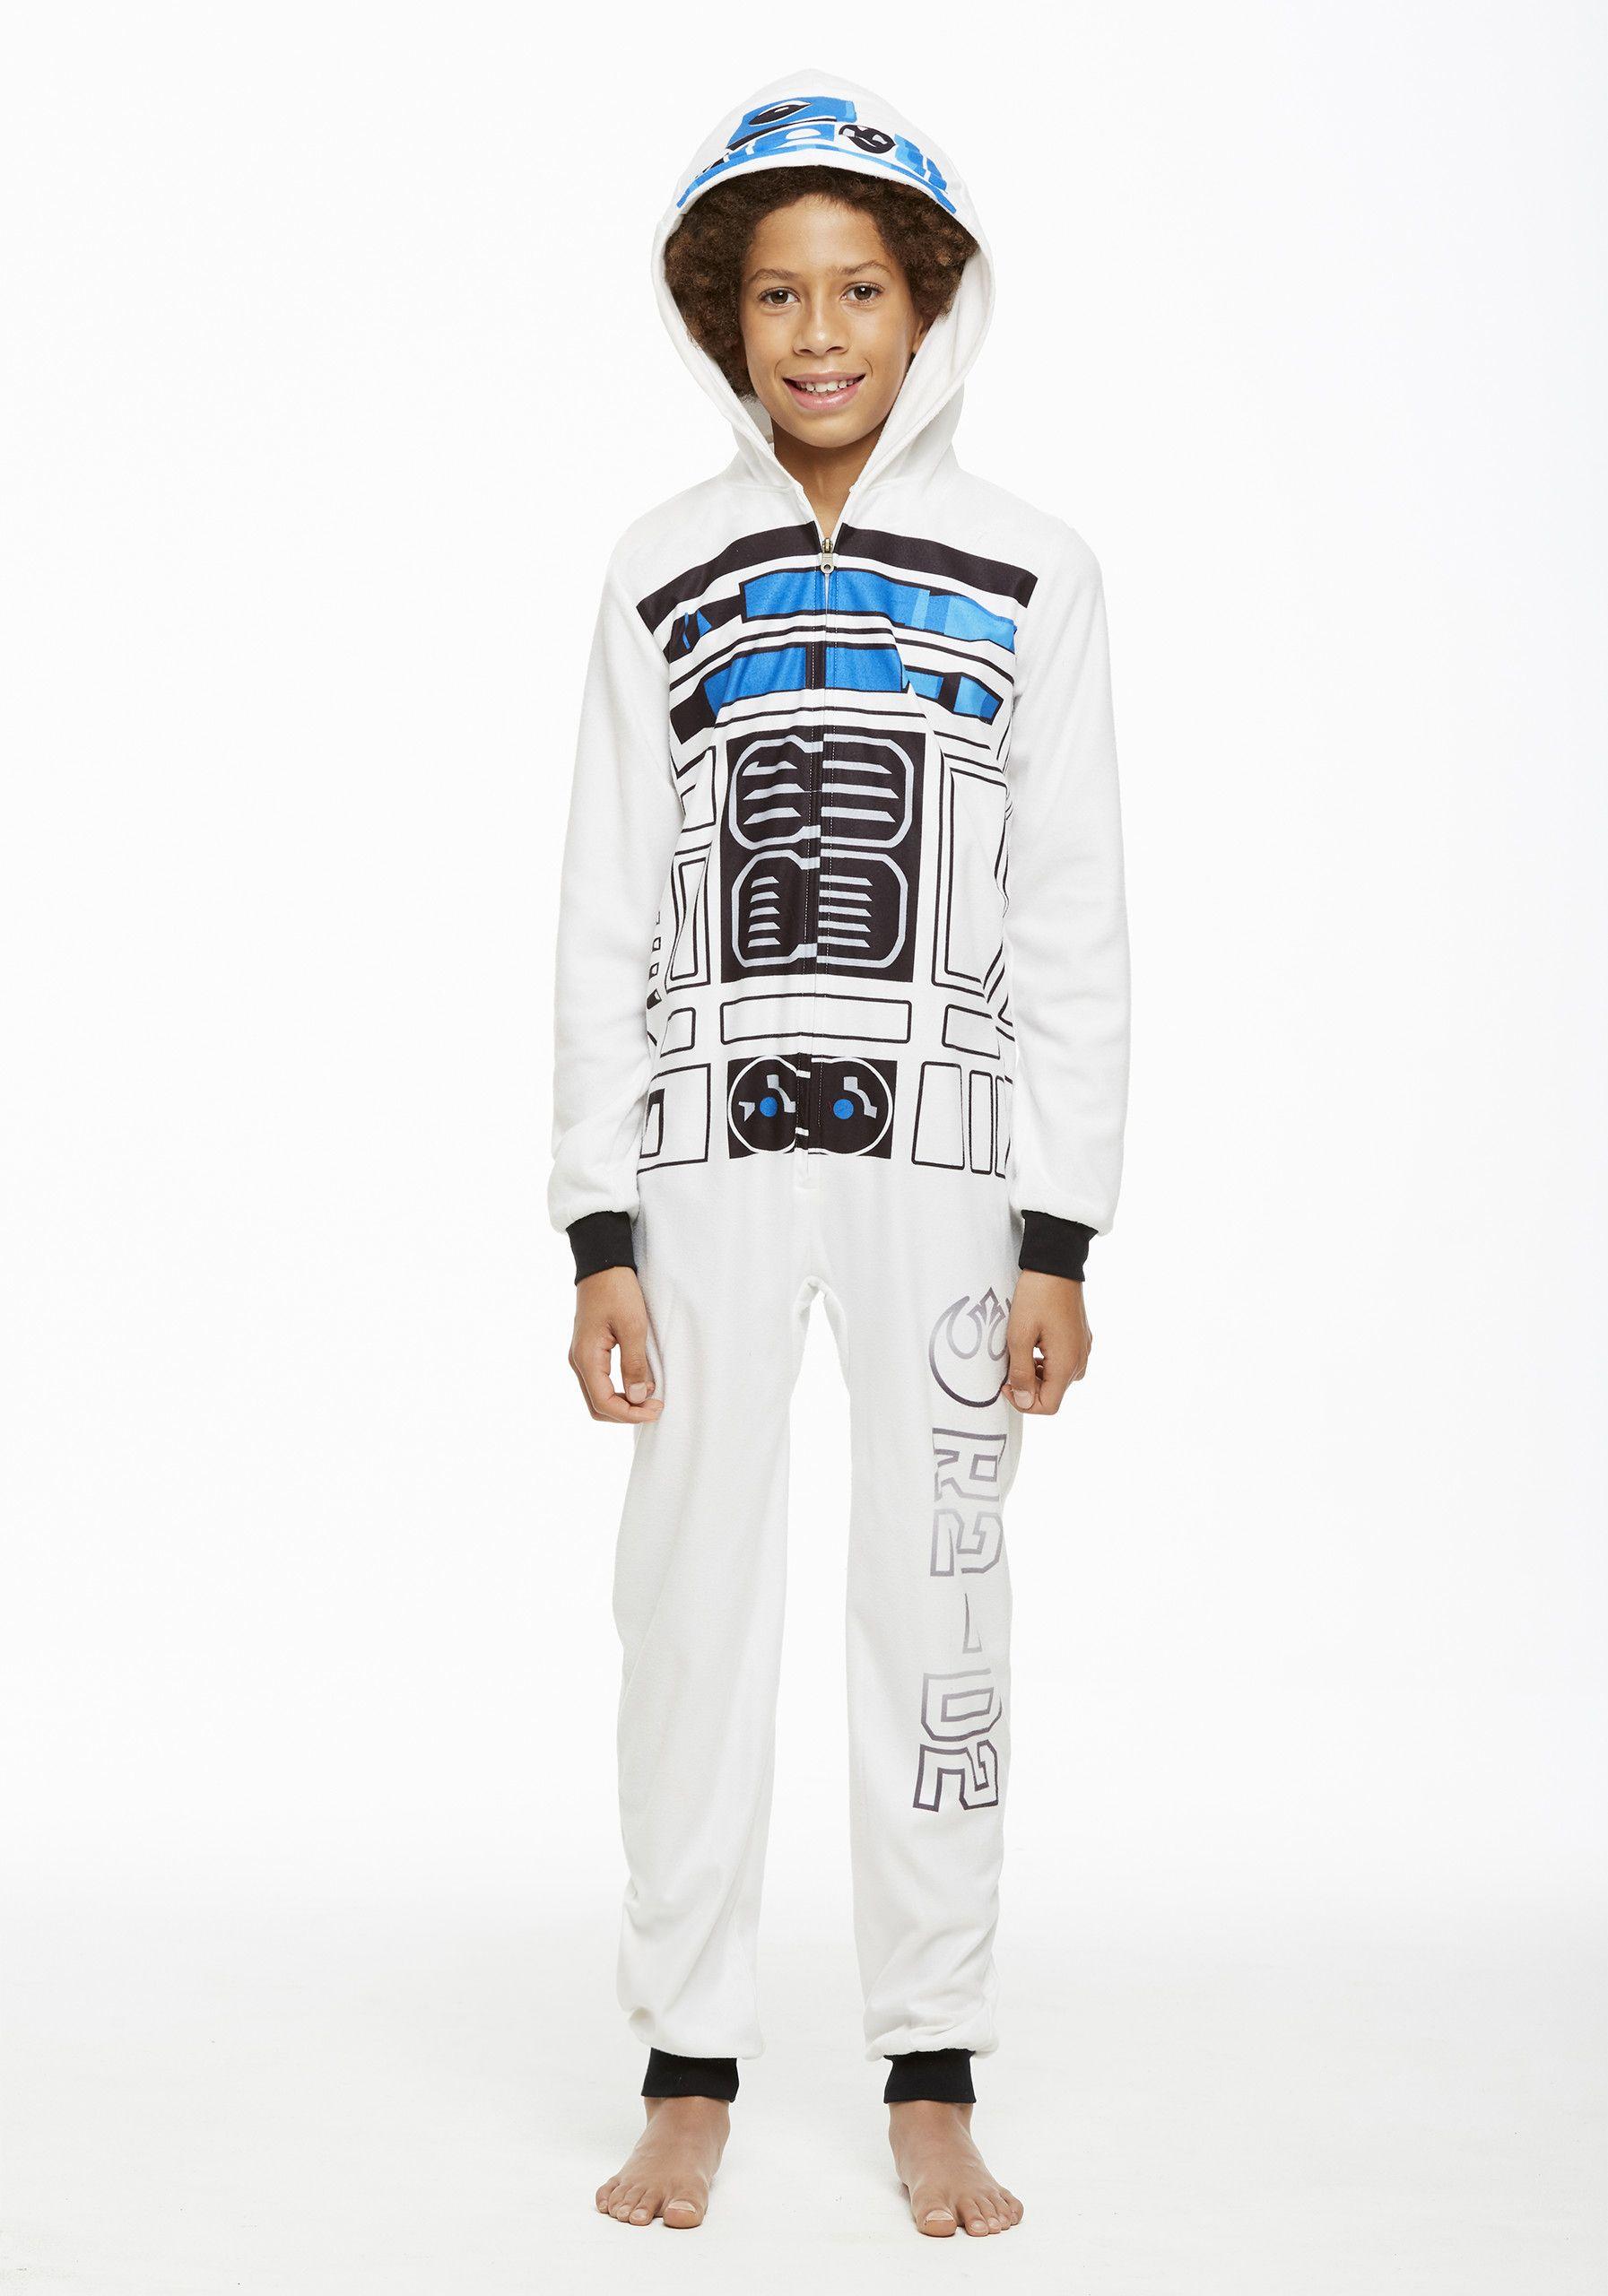 Jammin  Jammies Pajamas Unisex Kids Star Wars R2D2 Onesie With Pillow Case.  Size XS dde324fec